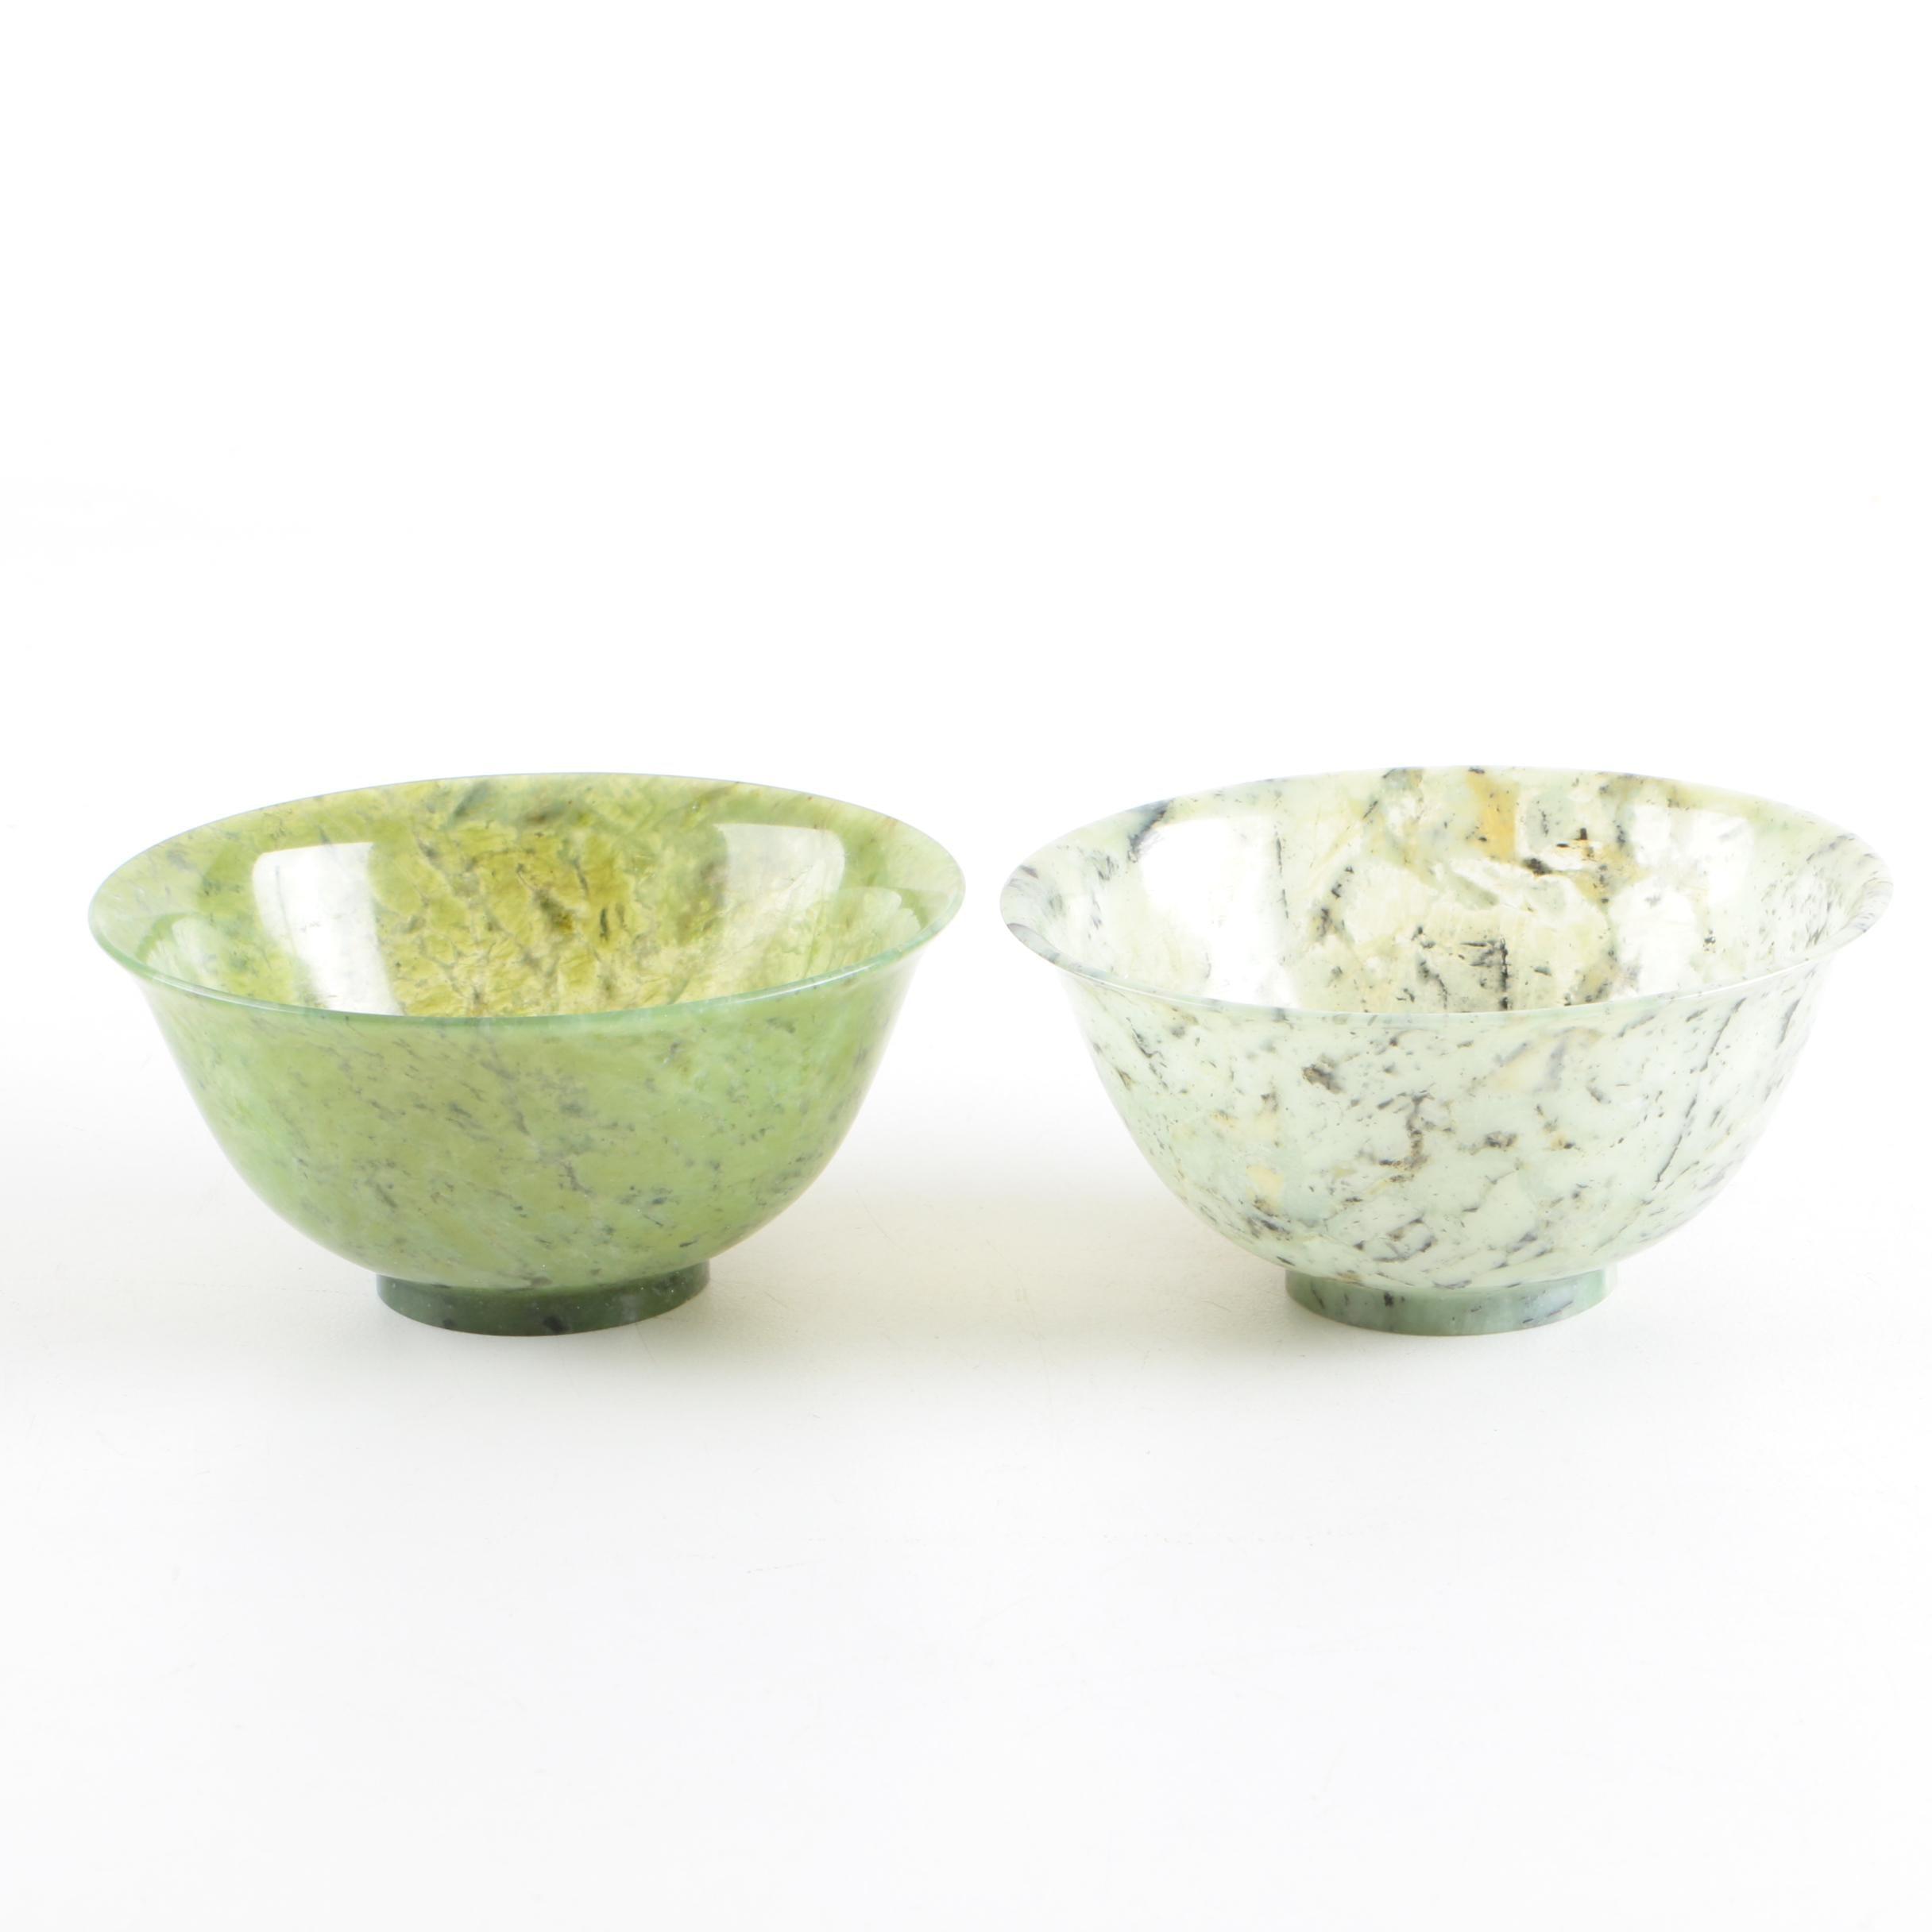 Chinese Serpentine Bowls